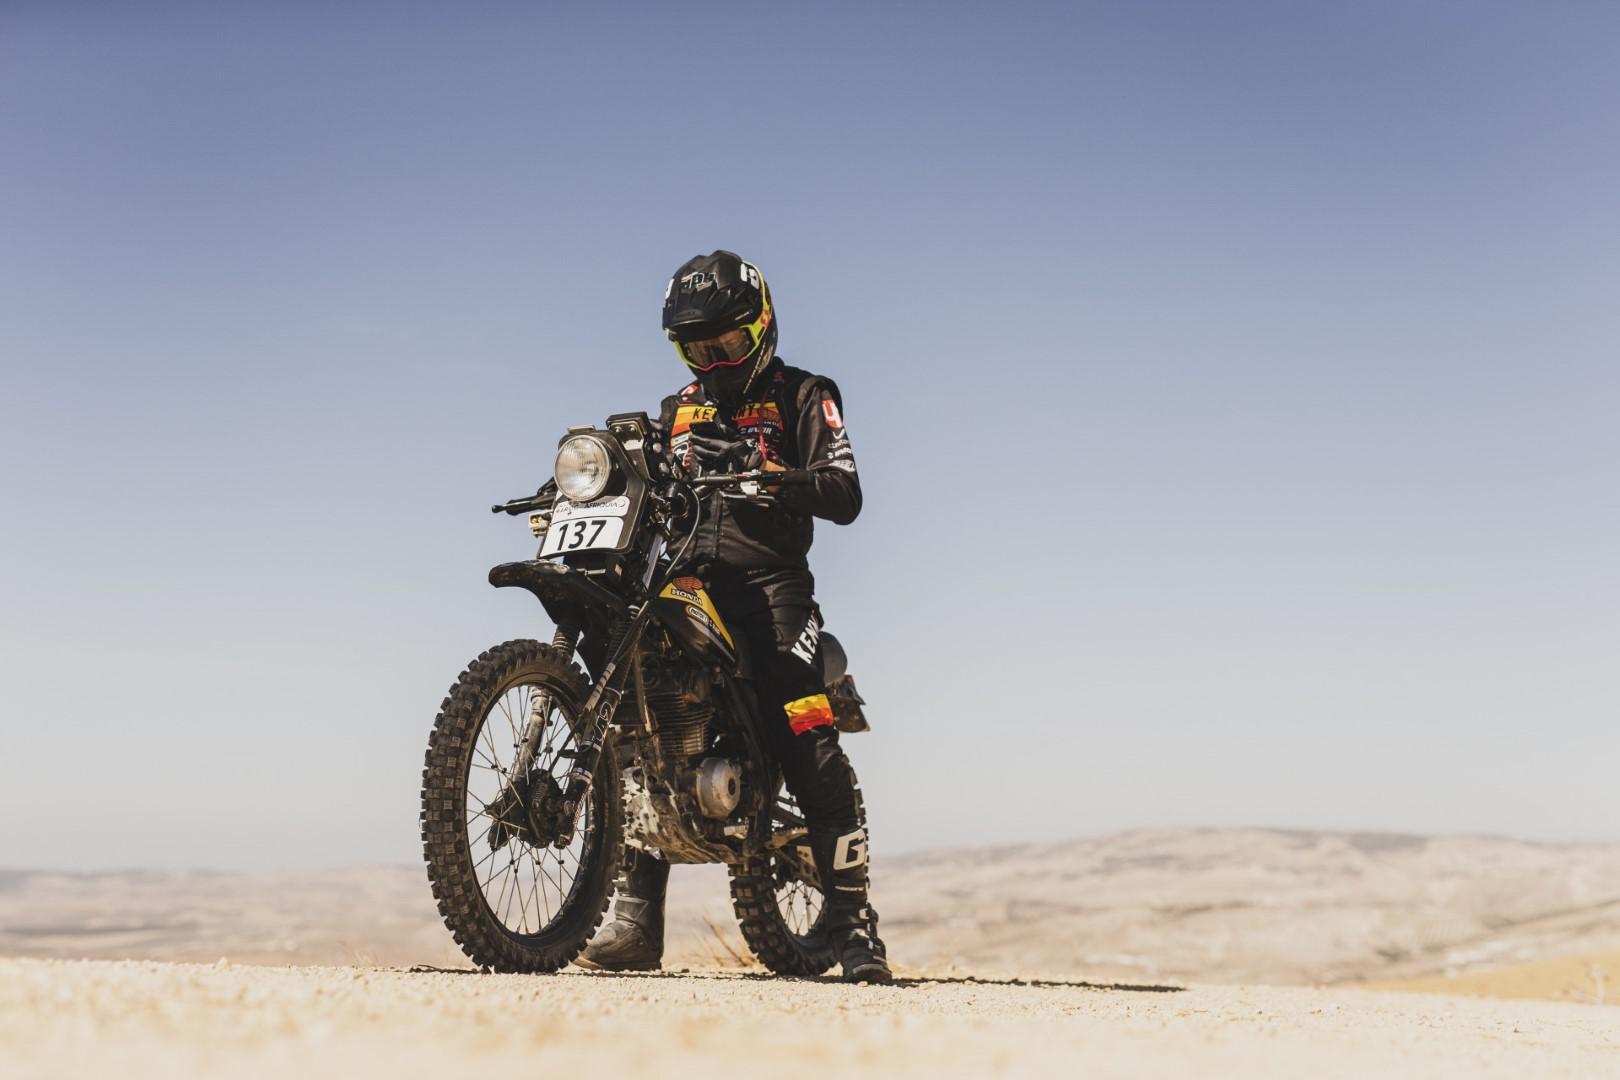 Le défi d'un Rallye Raid en 125cc de 40 ans